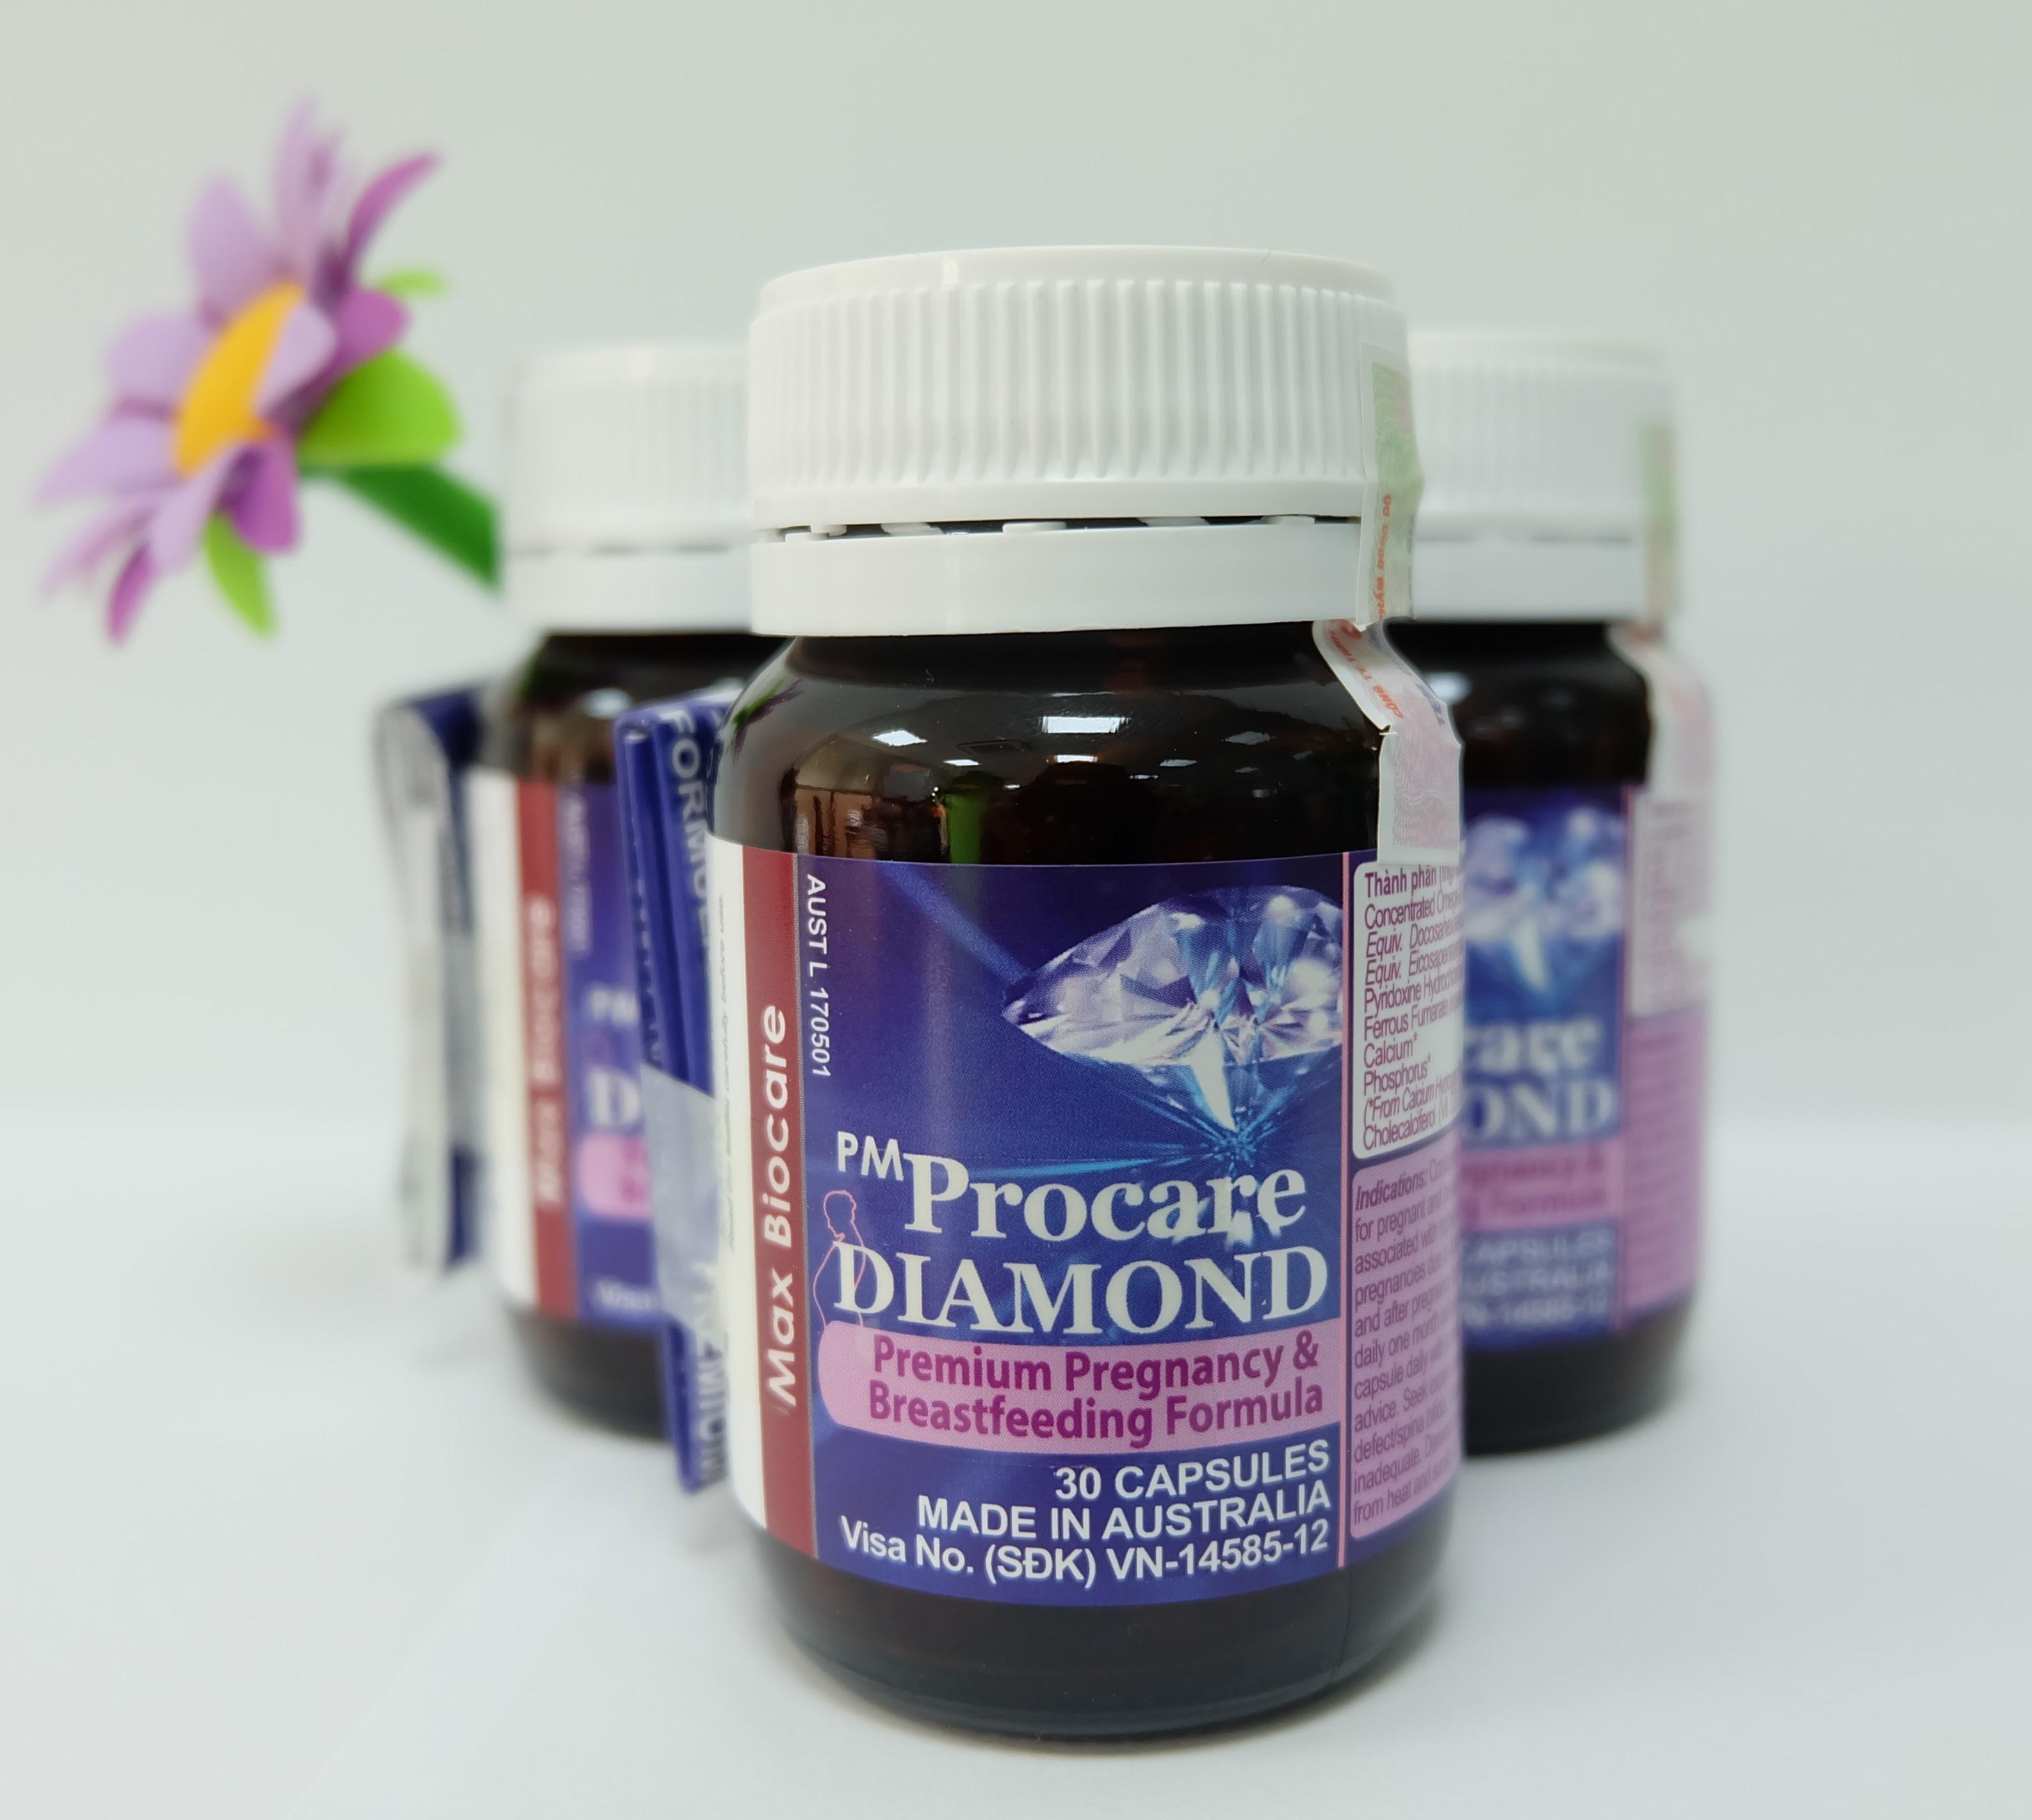 Viên uống PM Procare Diamond